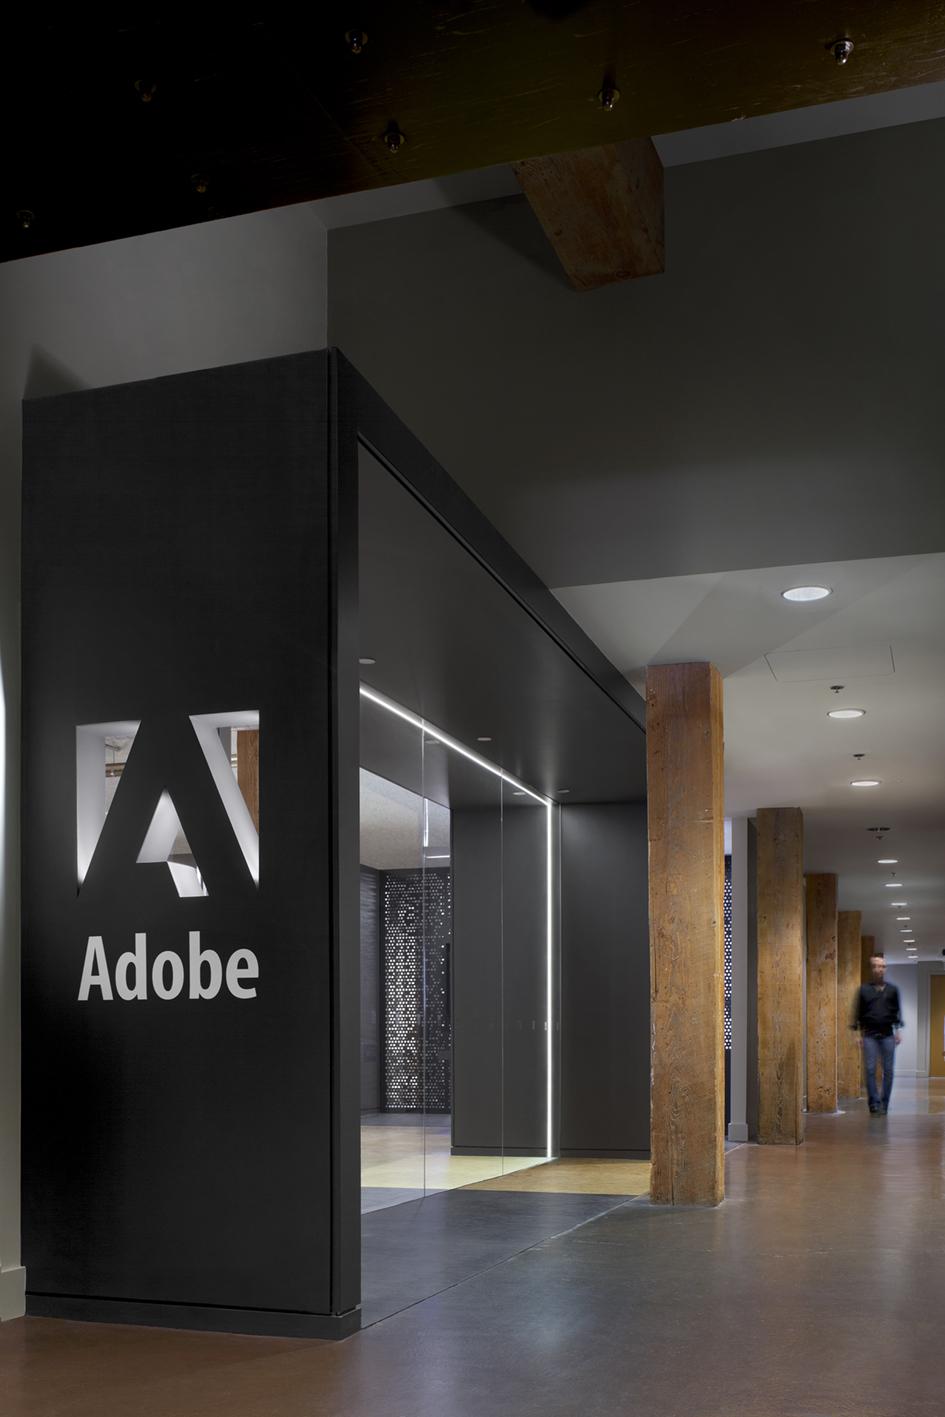 Adobe 410 Townsend